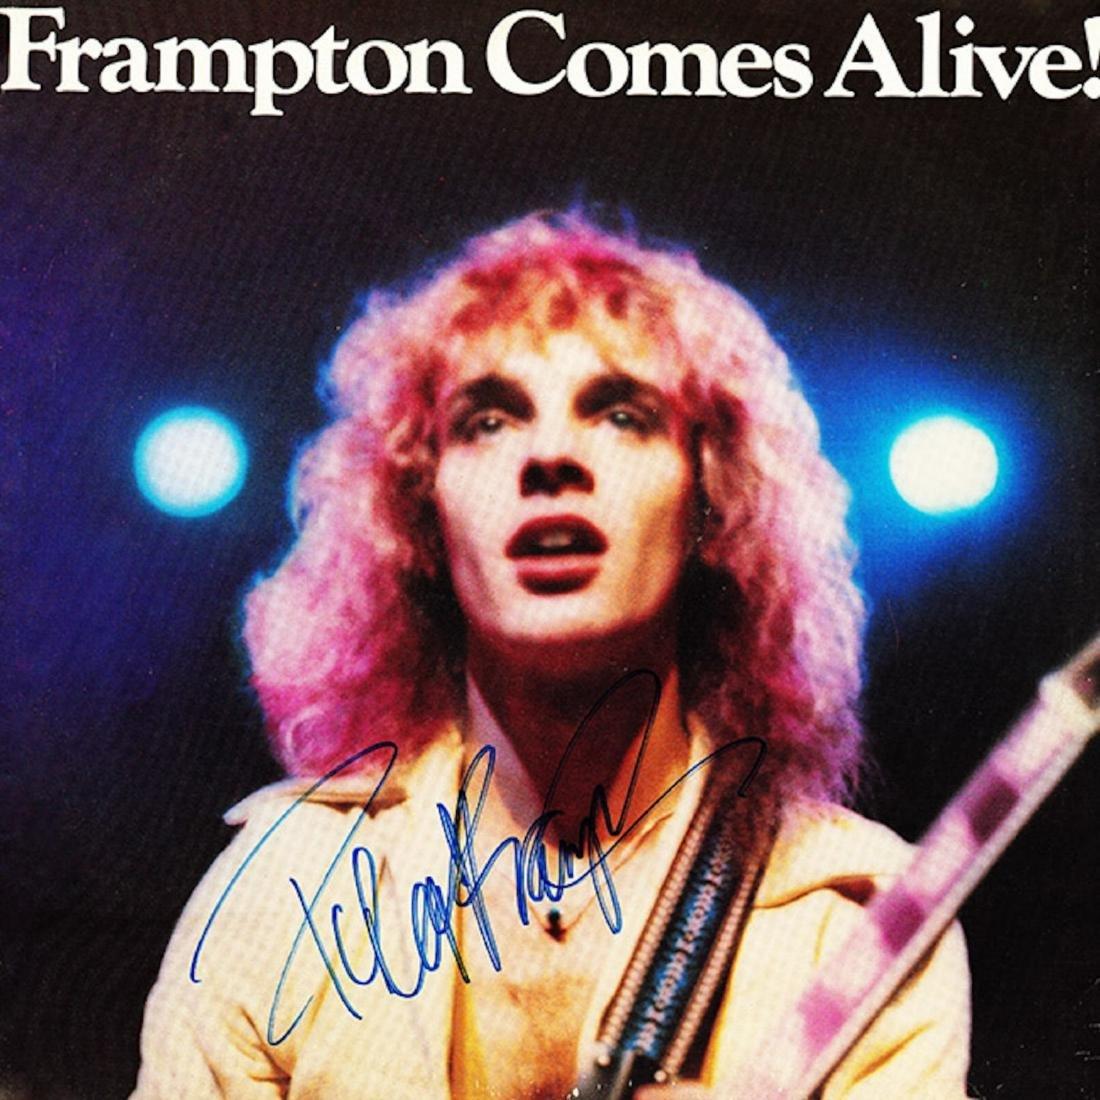 Signed Frampton Comes Alive Album